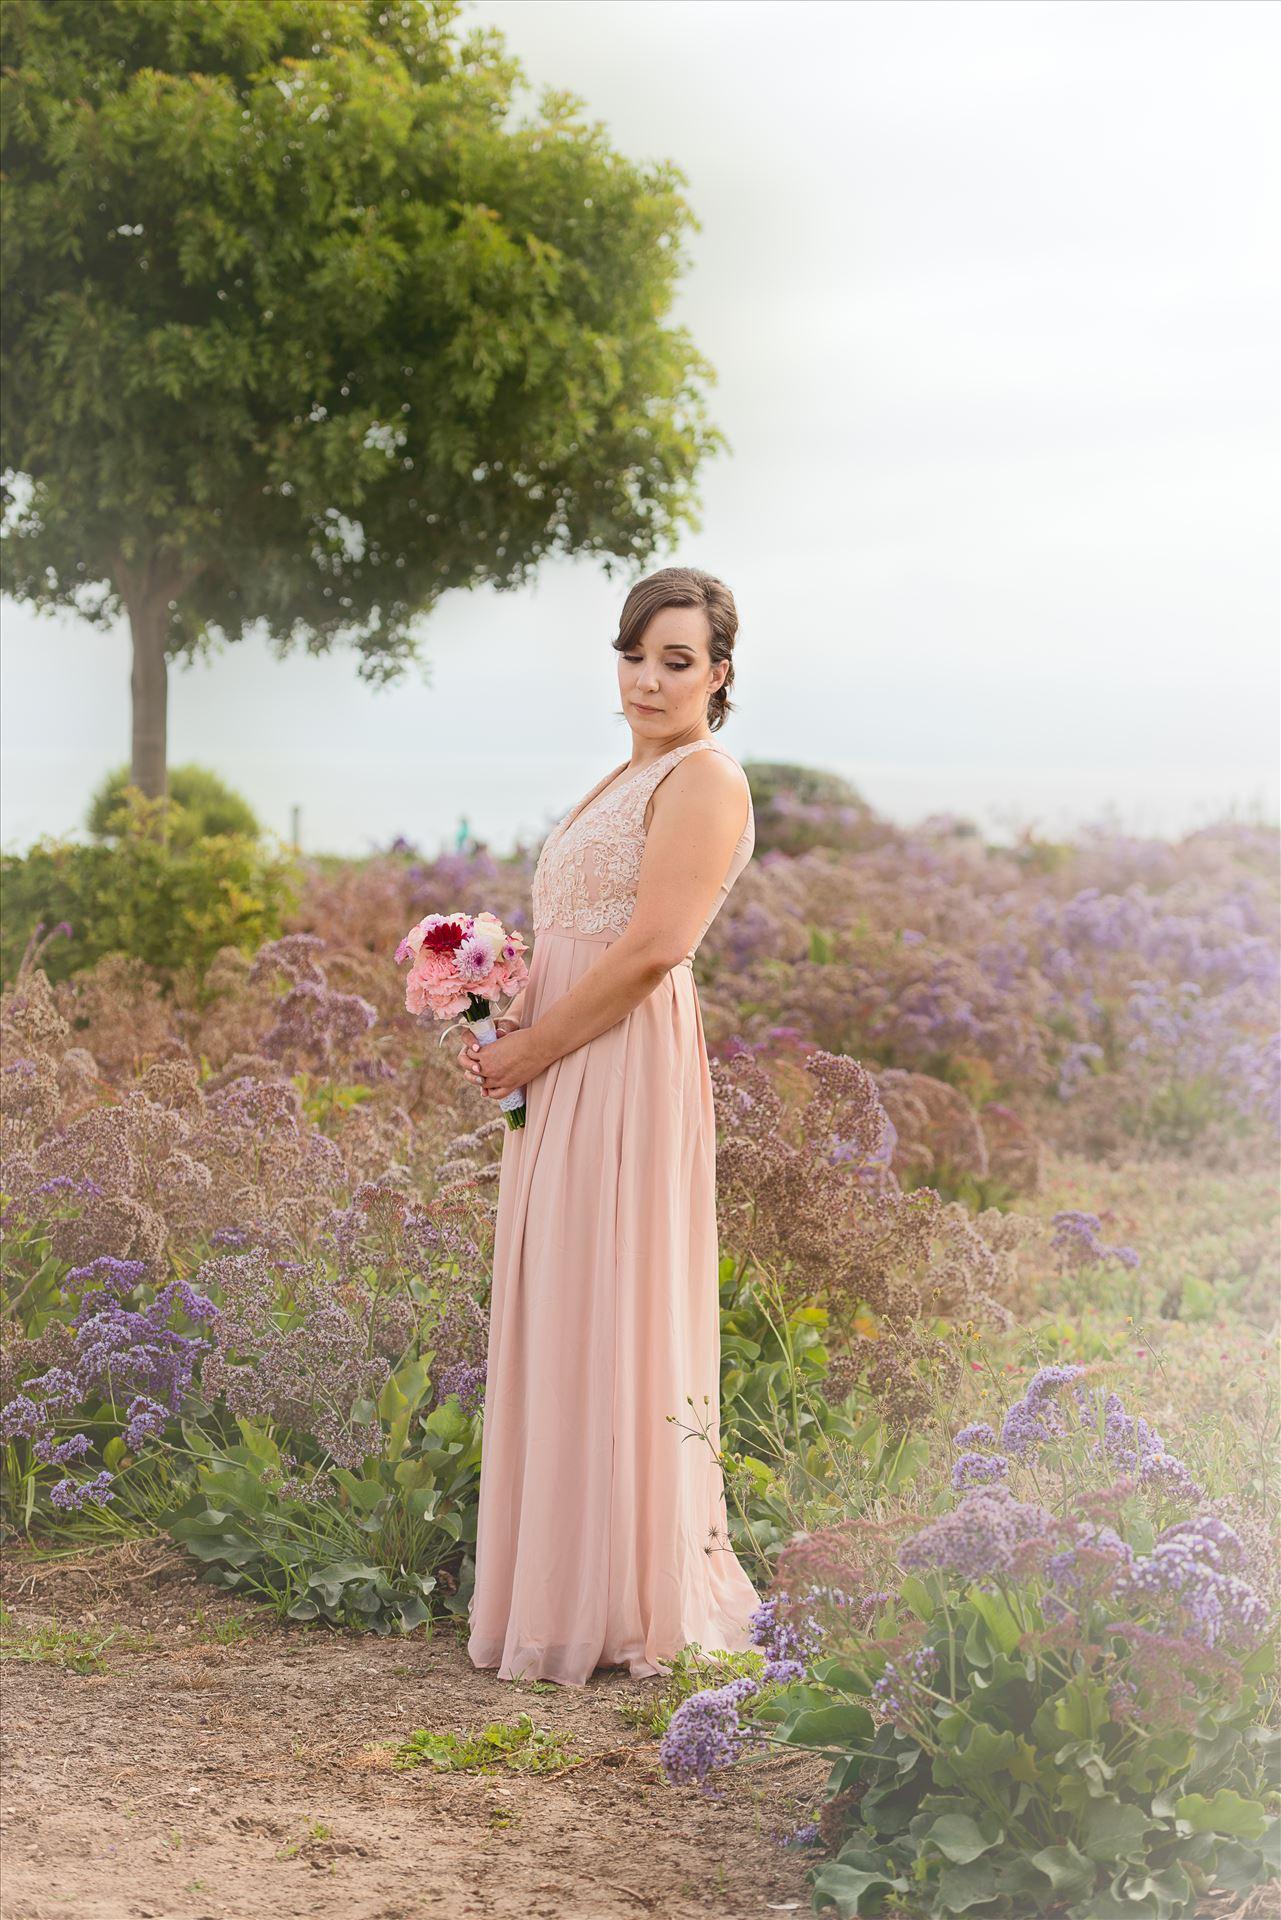 Courtney and Ruiz Shell Beach Wedding 02  by Sarah Williams